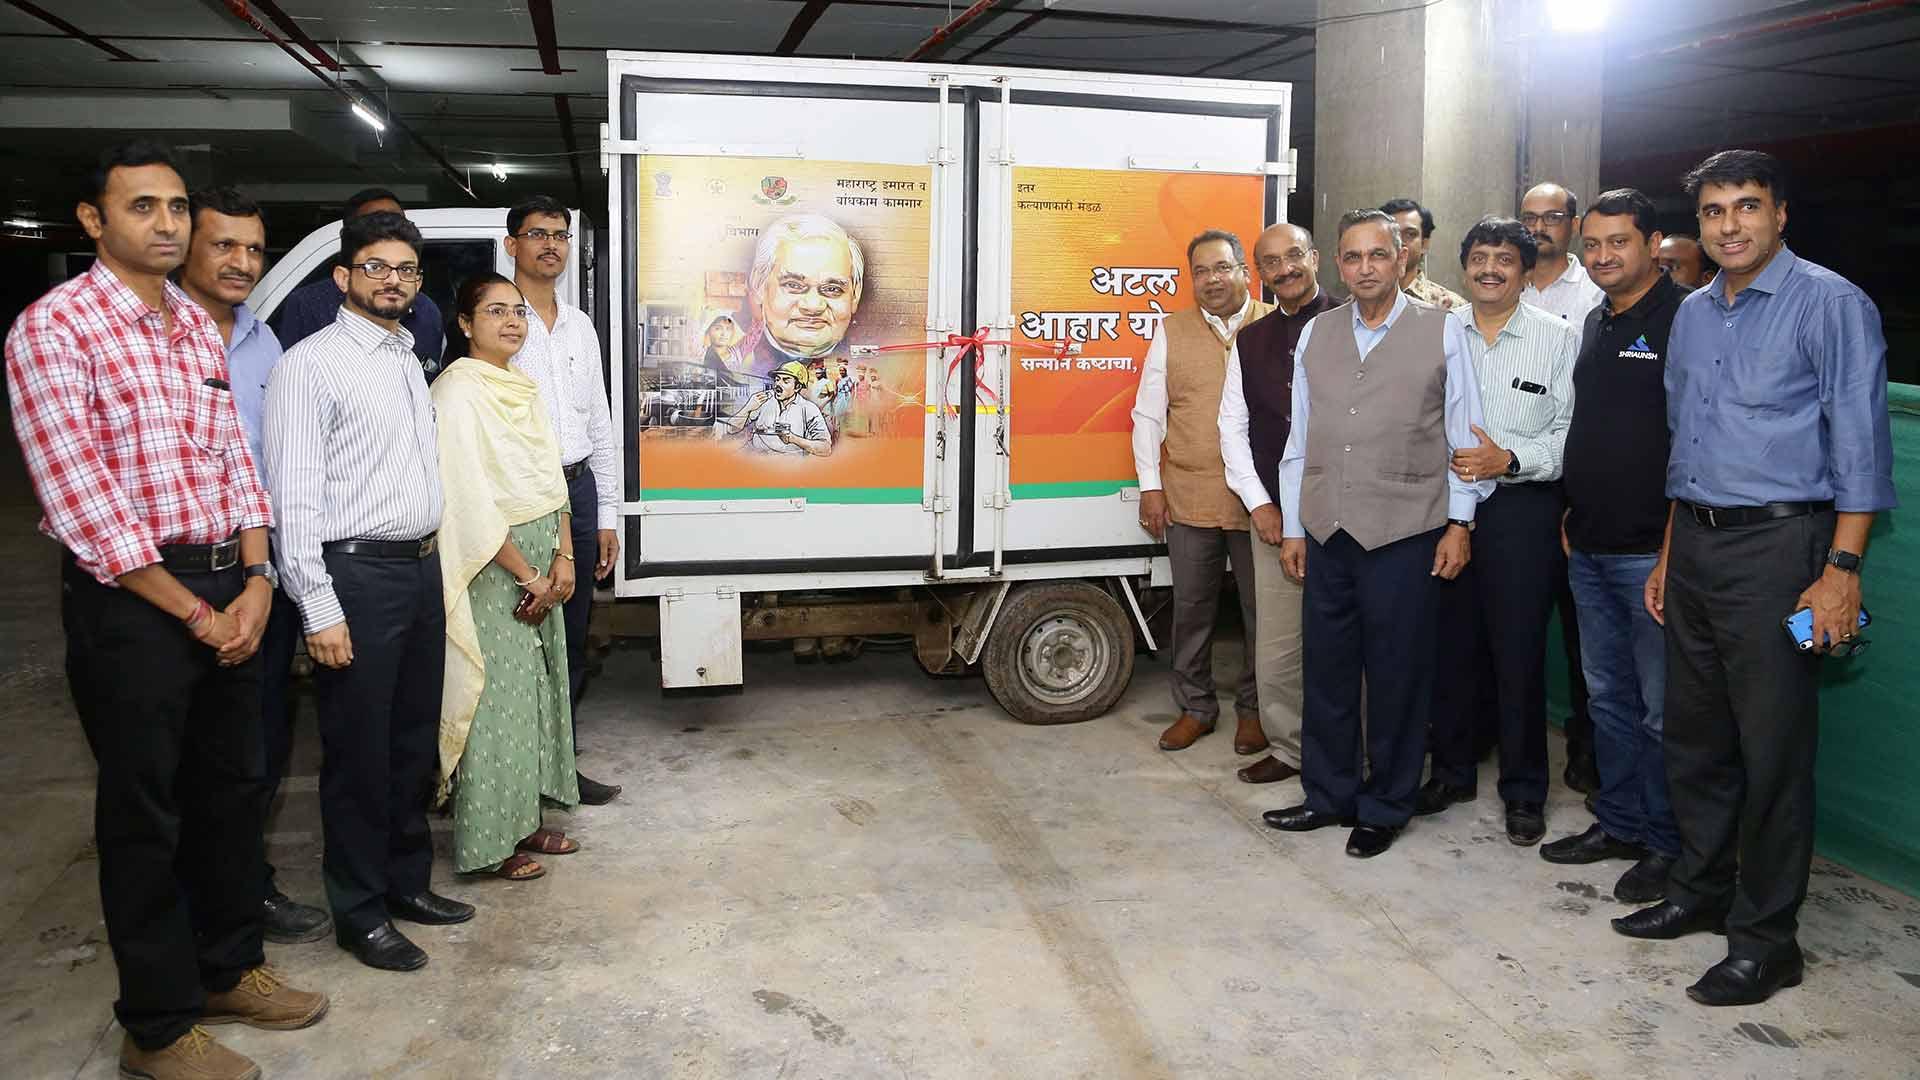 Launching of Atal Aahar Yojana Program held on Kalpataru Jade Site, Baner on 1st Aug, 2019